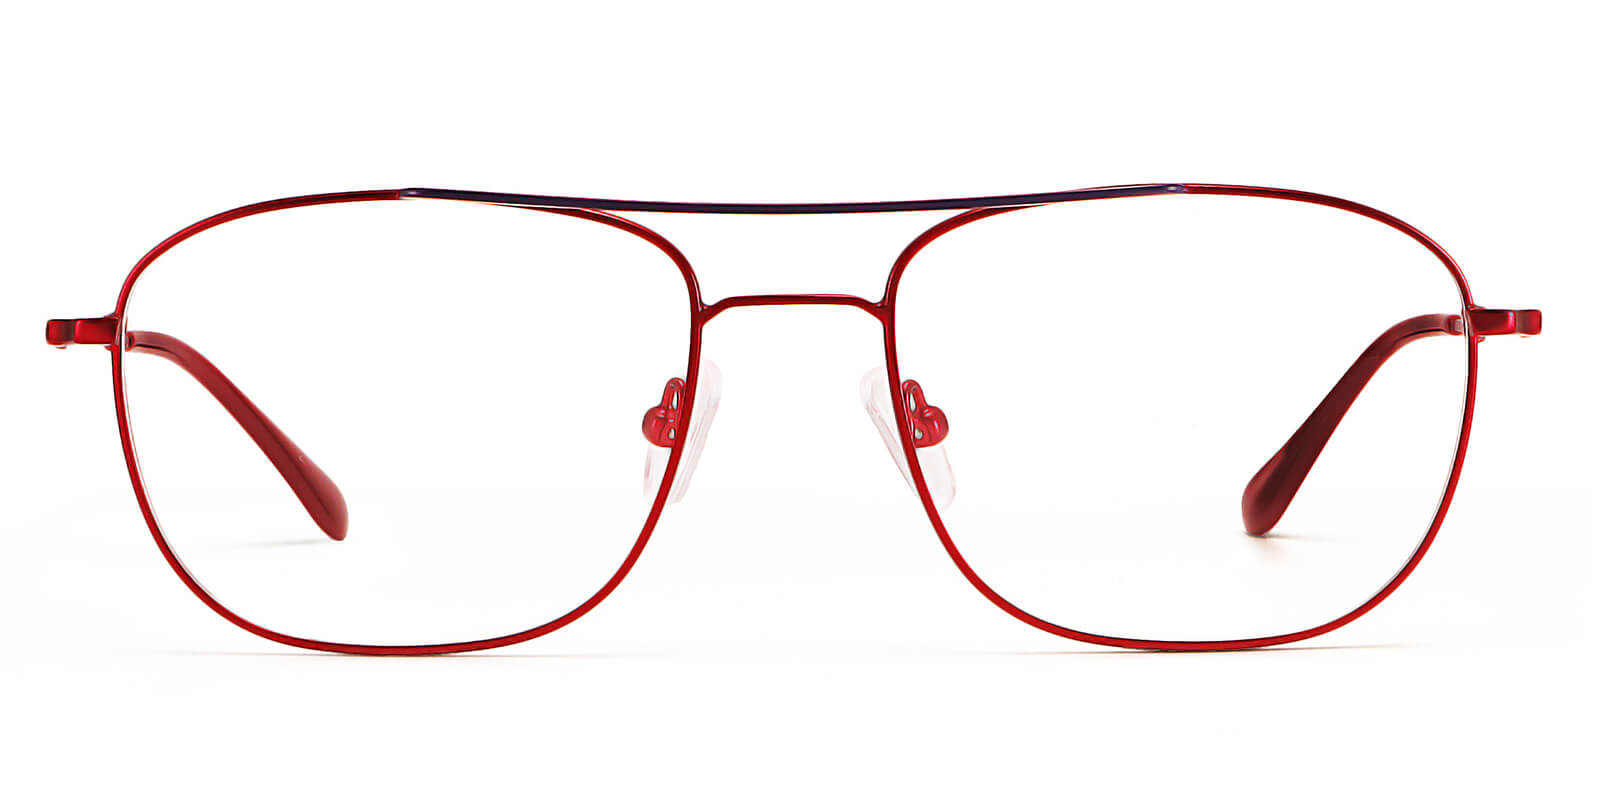 Sheer-Aviator glasses with ergonomic double-beam design